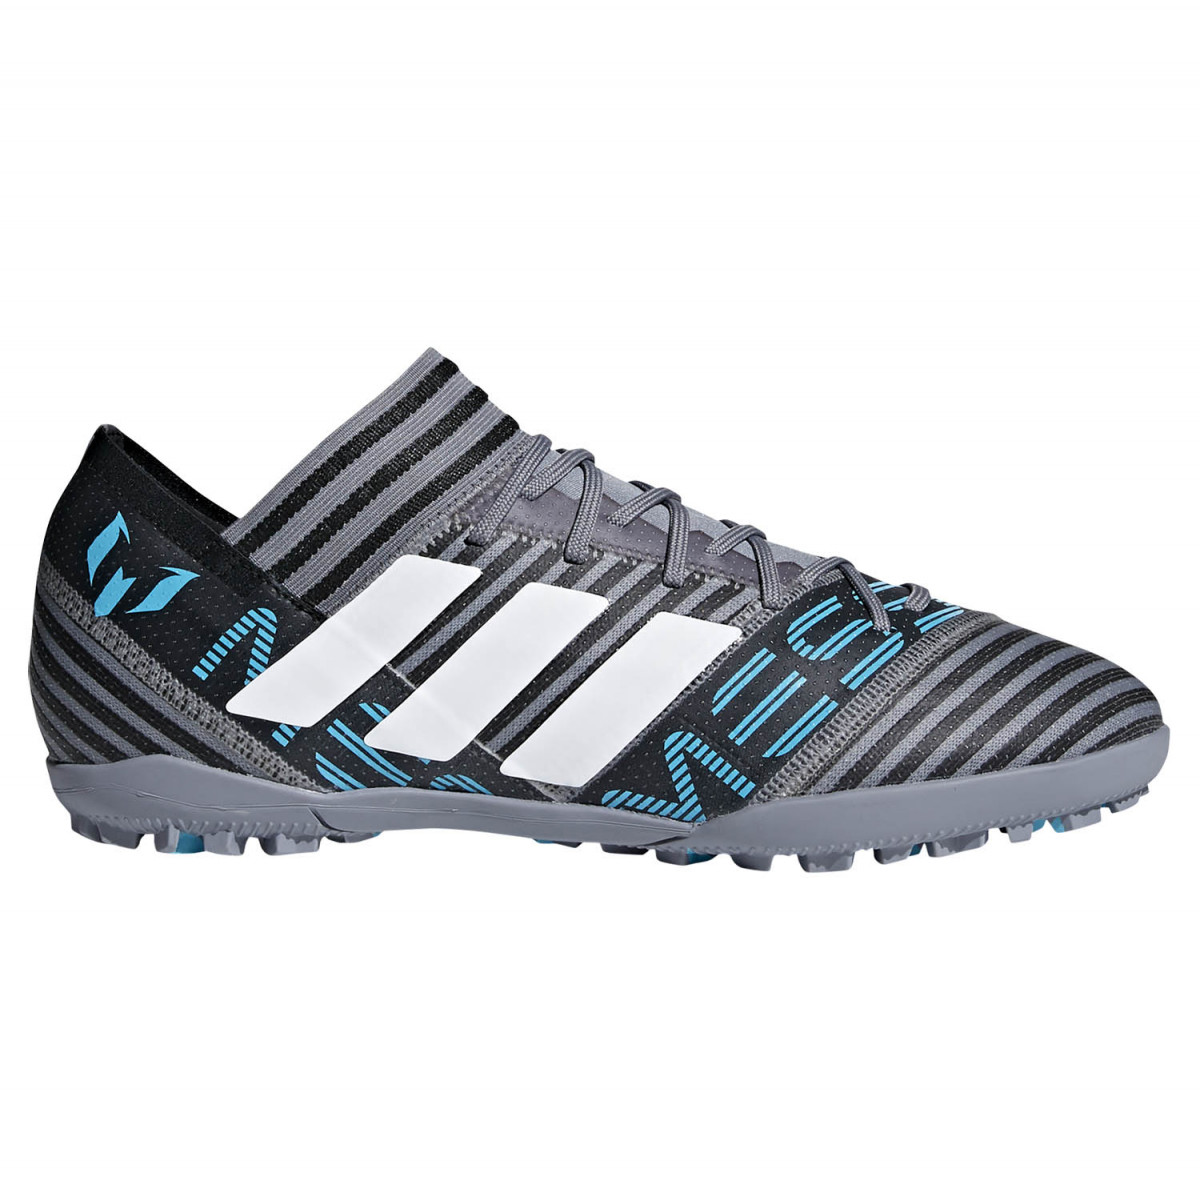 Botines Adidas Nemeziz Messi Tango